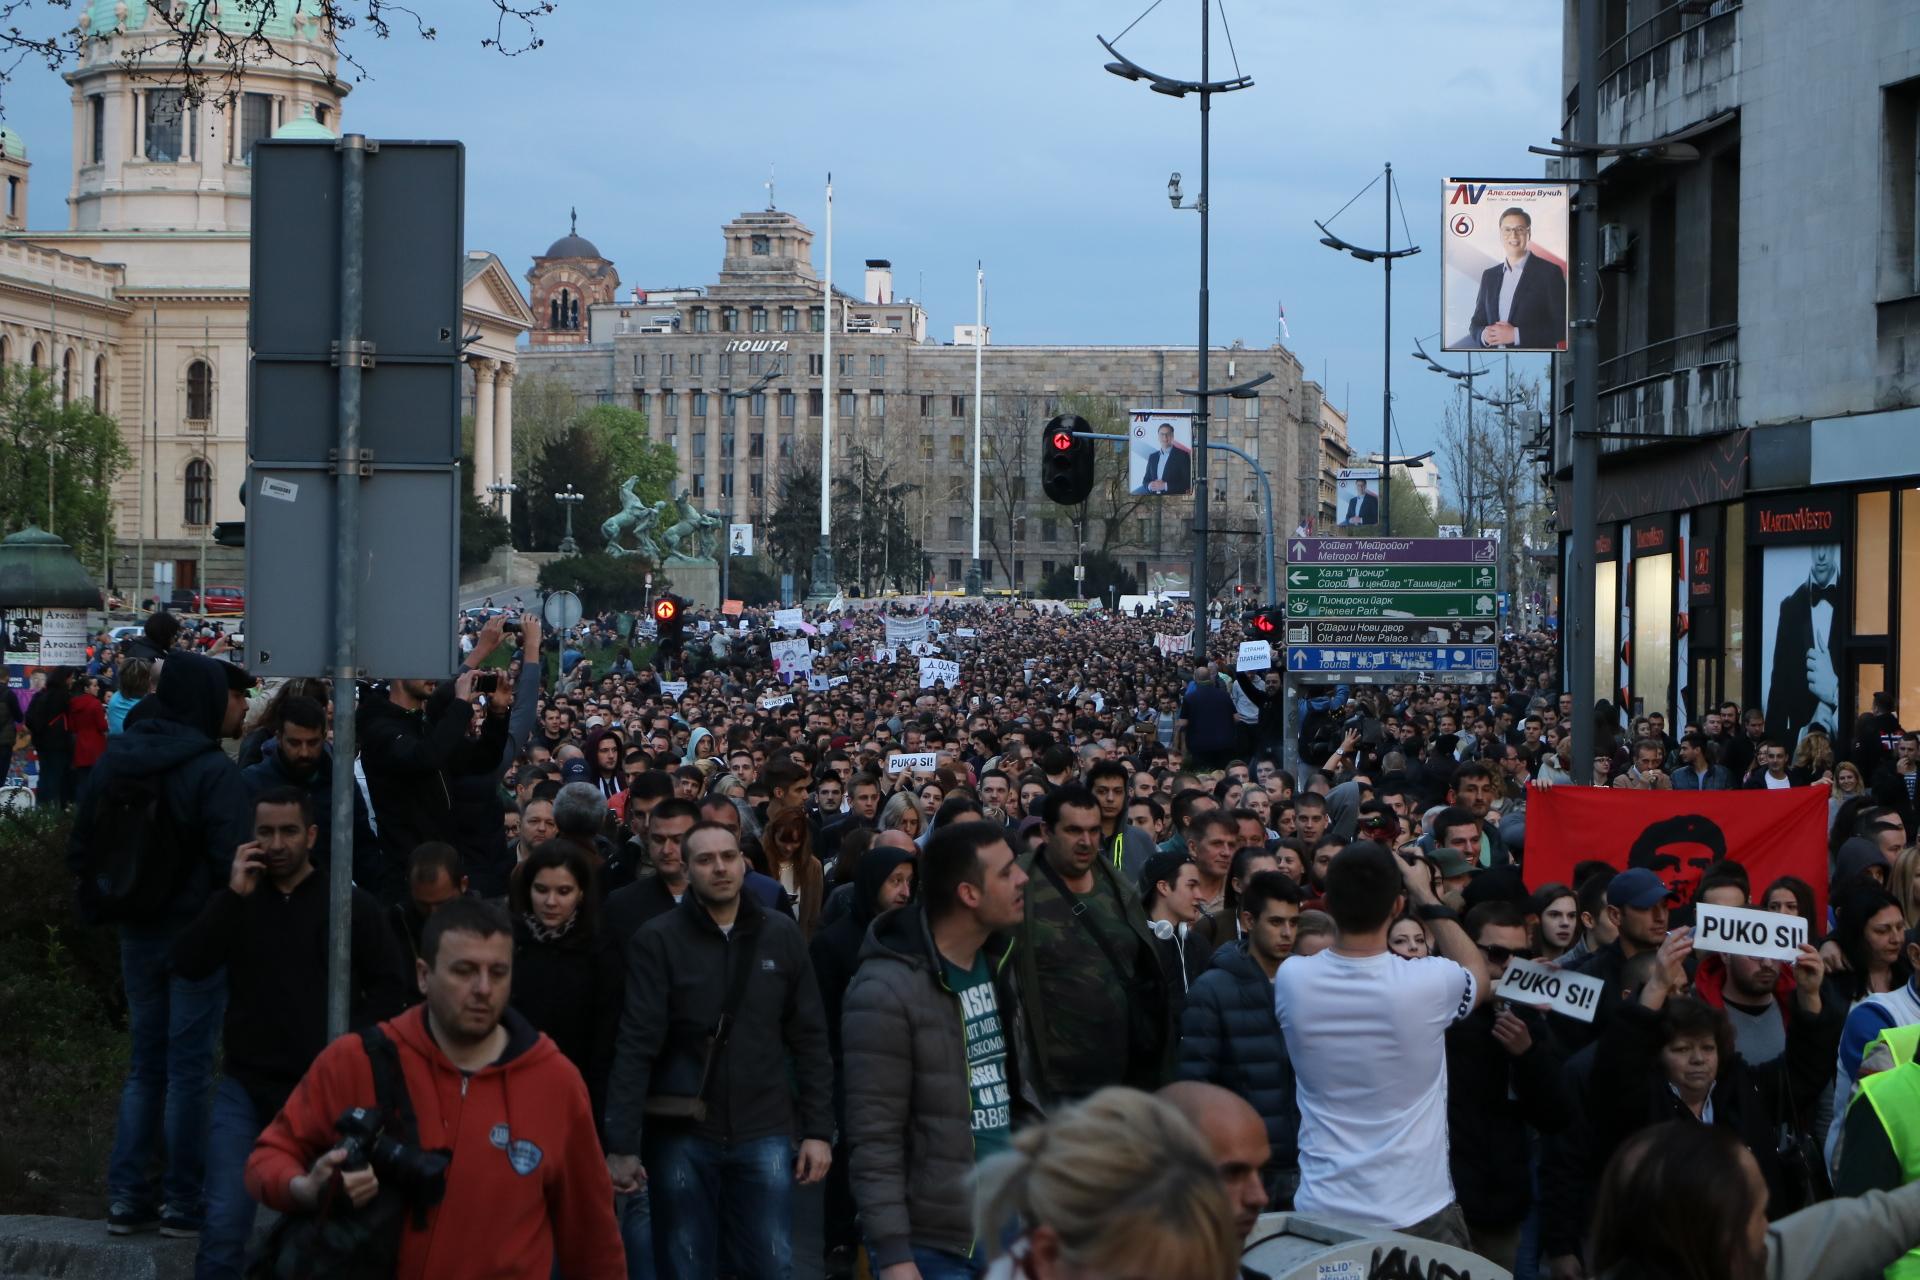 Radni sto #23: Protesti i mogućnost nove politike